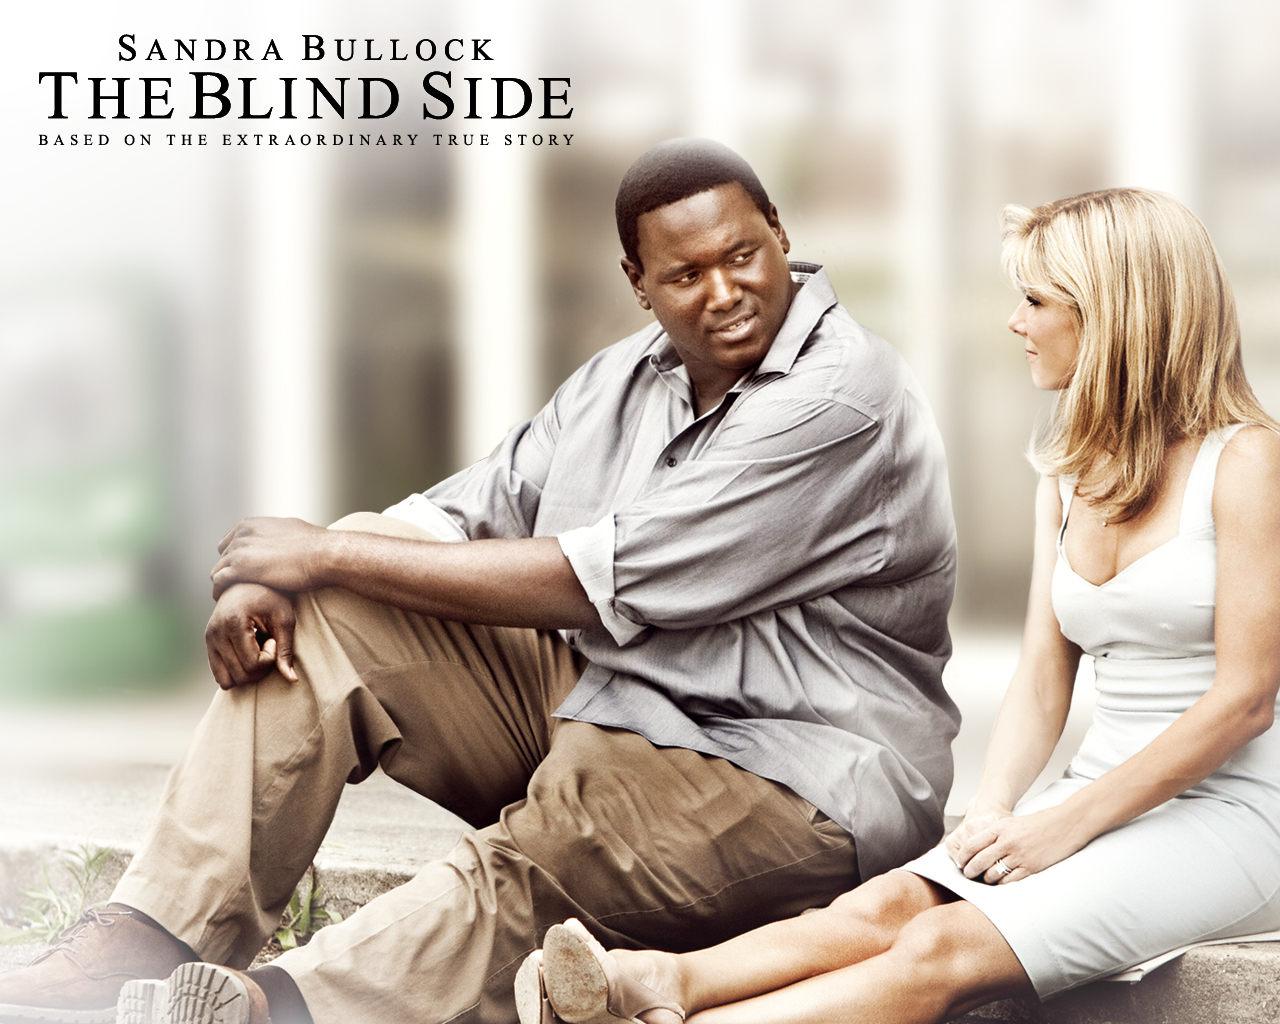 http://4.bp.blogspot.com/-PCRiH_iSWhw/TruLXaAnkfI/AAAAAAAACIk/ej_6JFKtd0M/s1600/The+blind+side.jpg